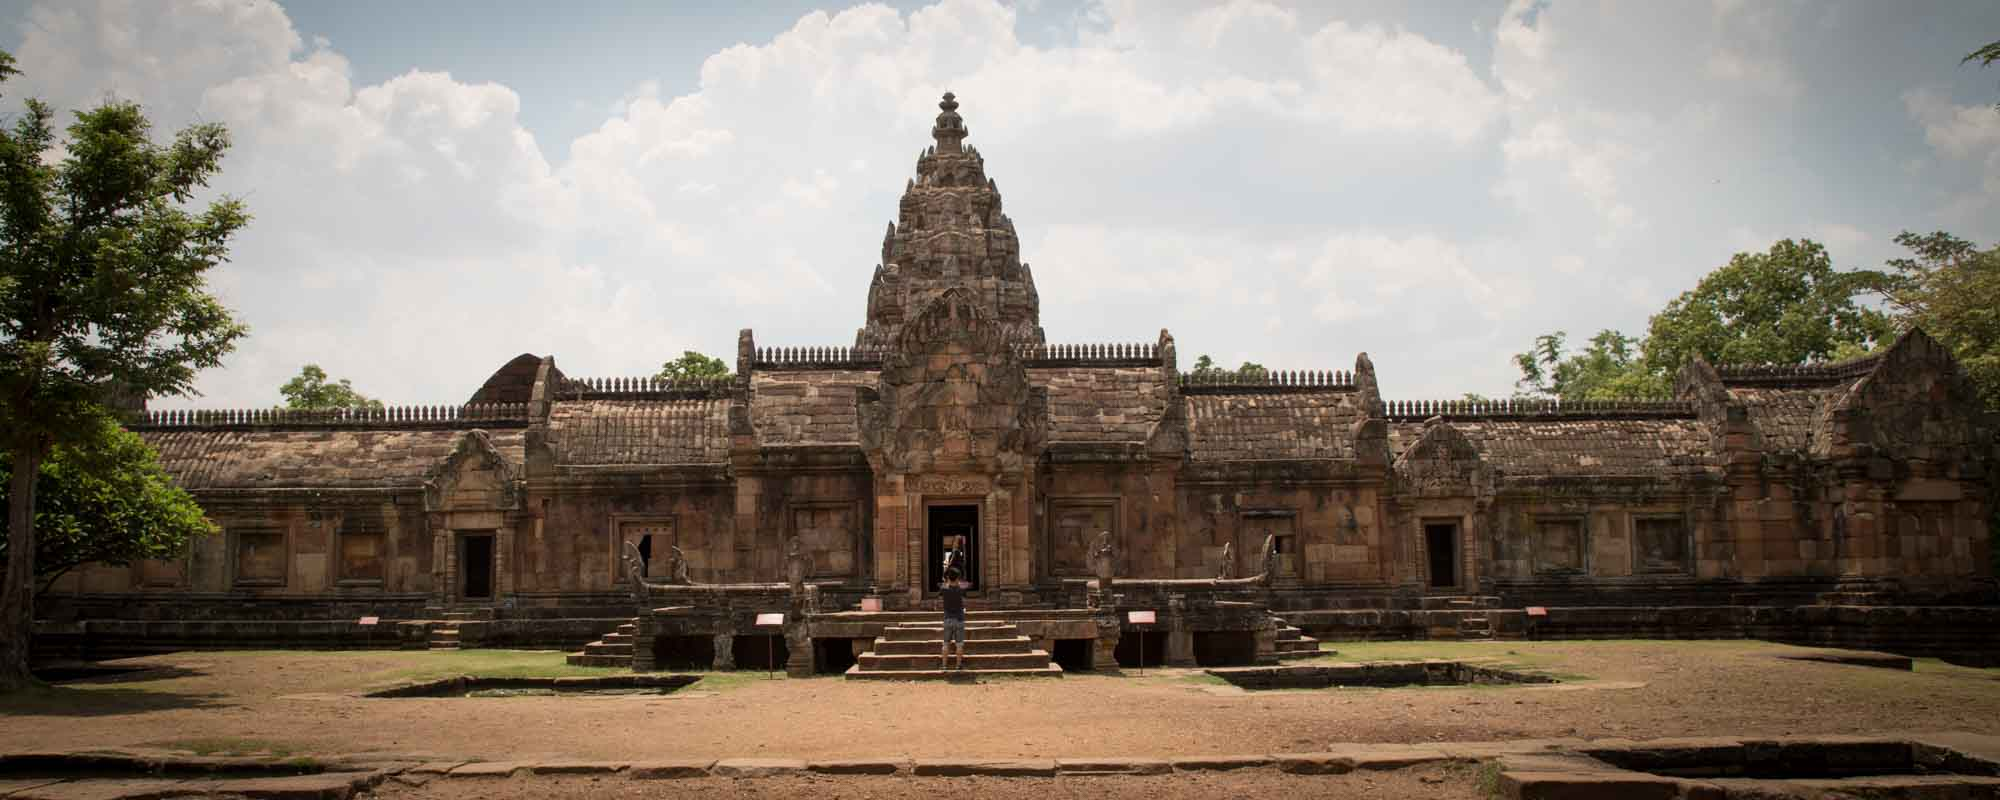 帕儂藍寺 (Phanom Rung)